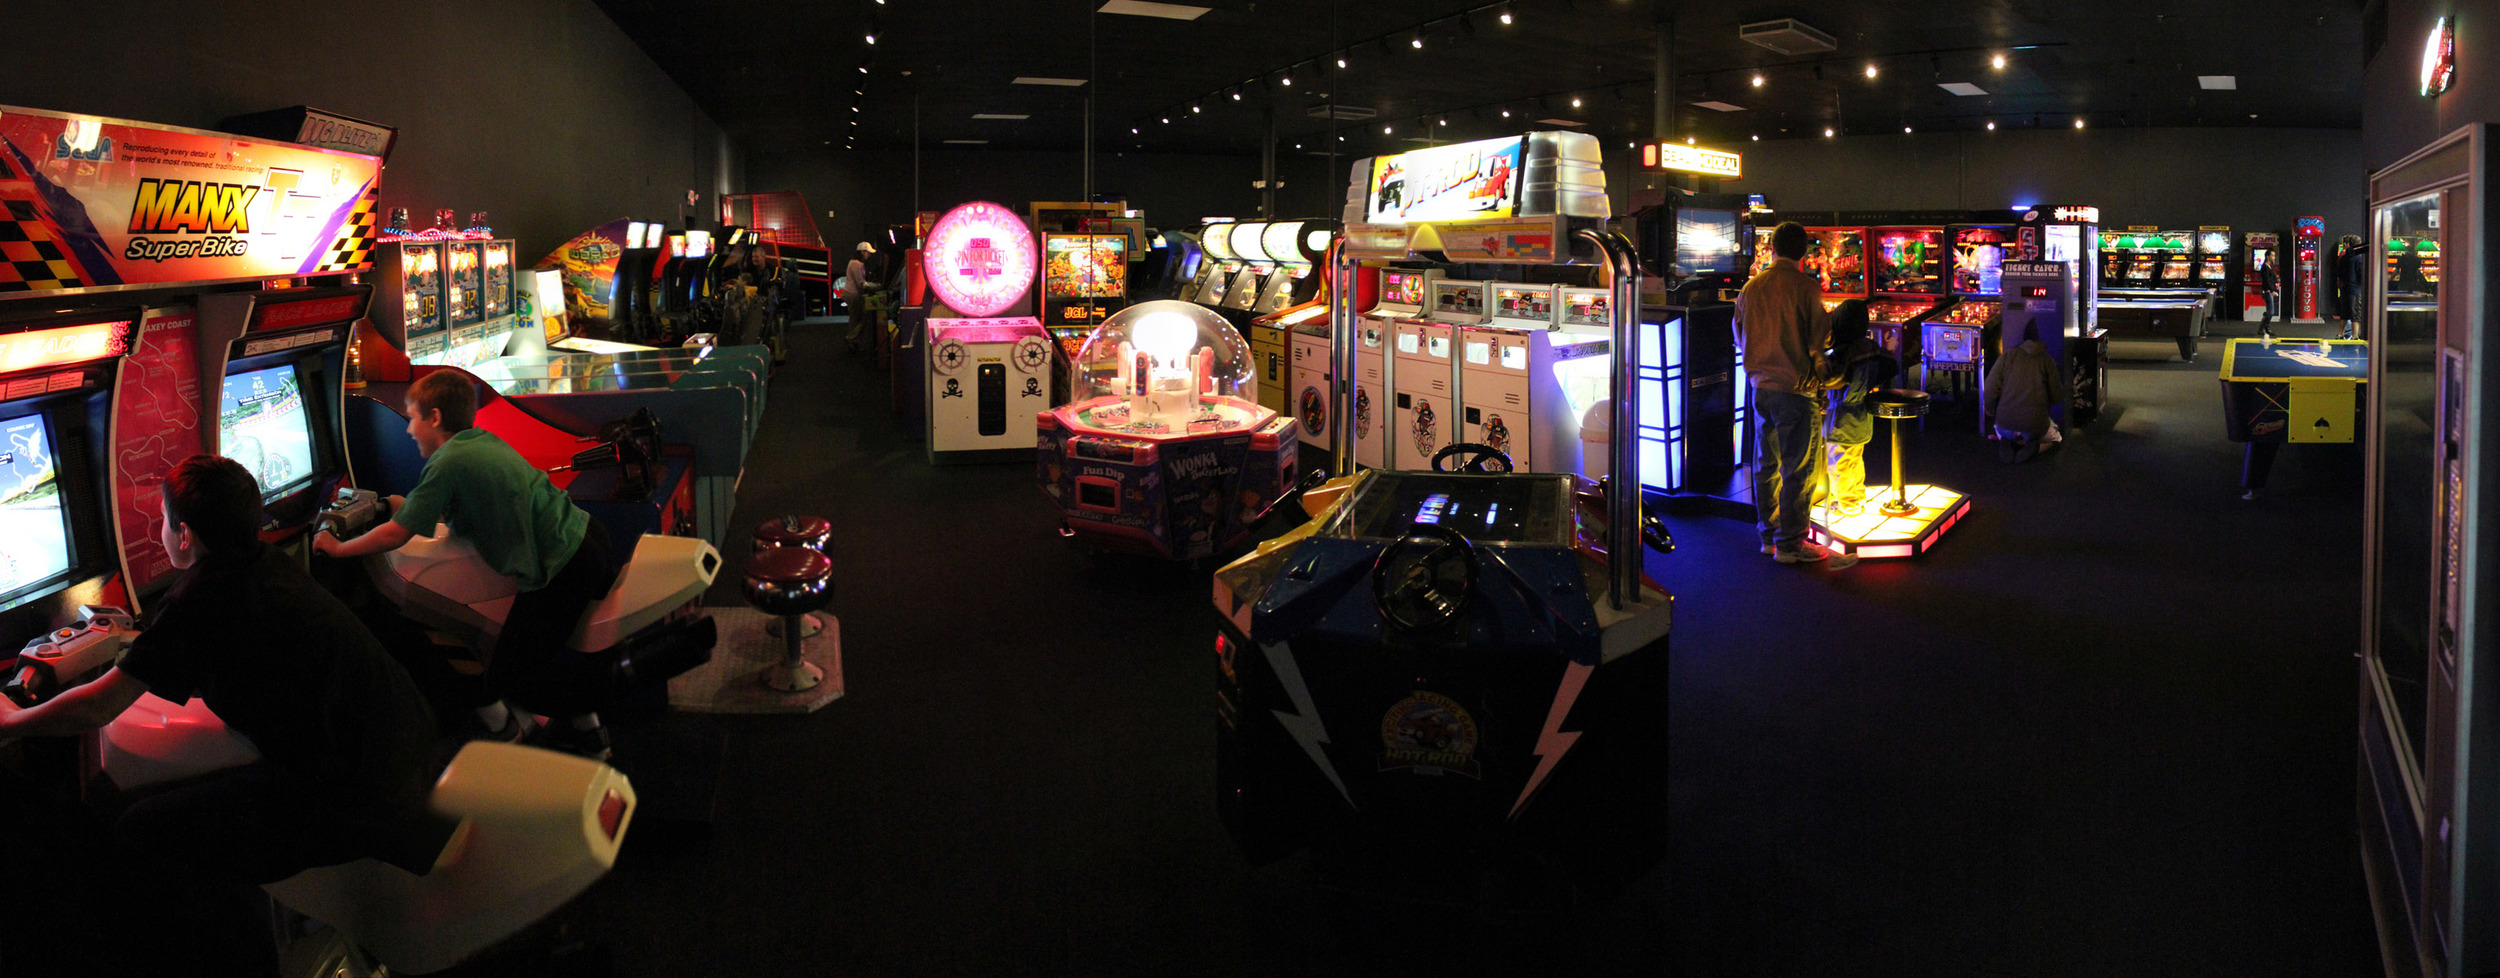 Pinball_Wizard_Arcade_Panorama_13-large